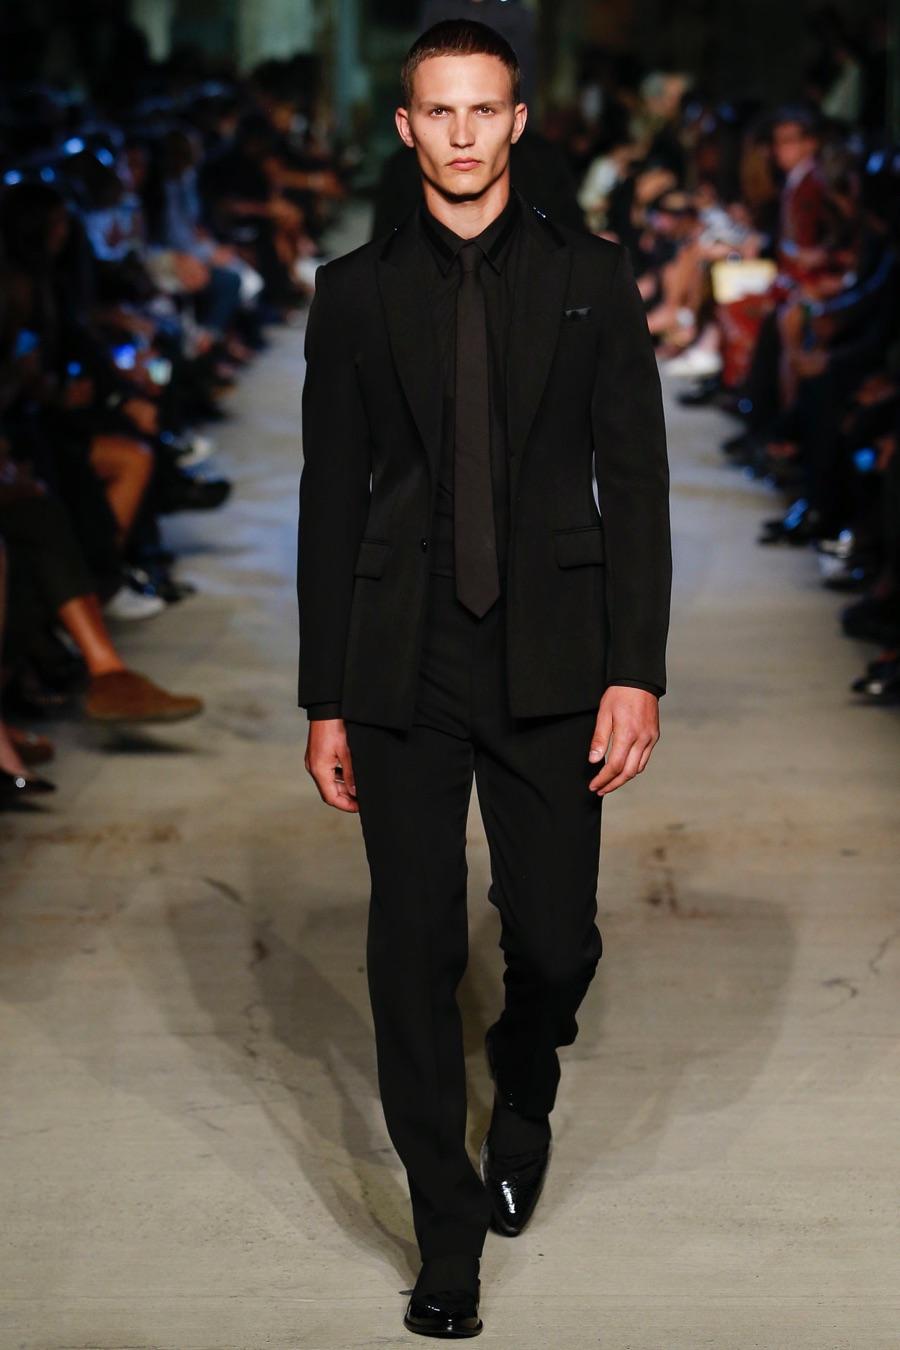 Givenchy-Spring-Summer-2016-Menswear-Collection-New-York-Fashion-Week-017.jpg